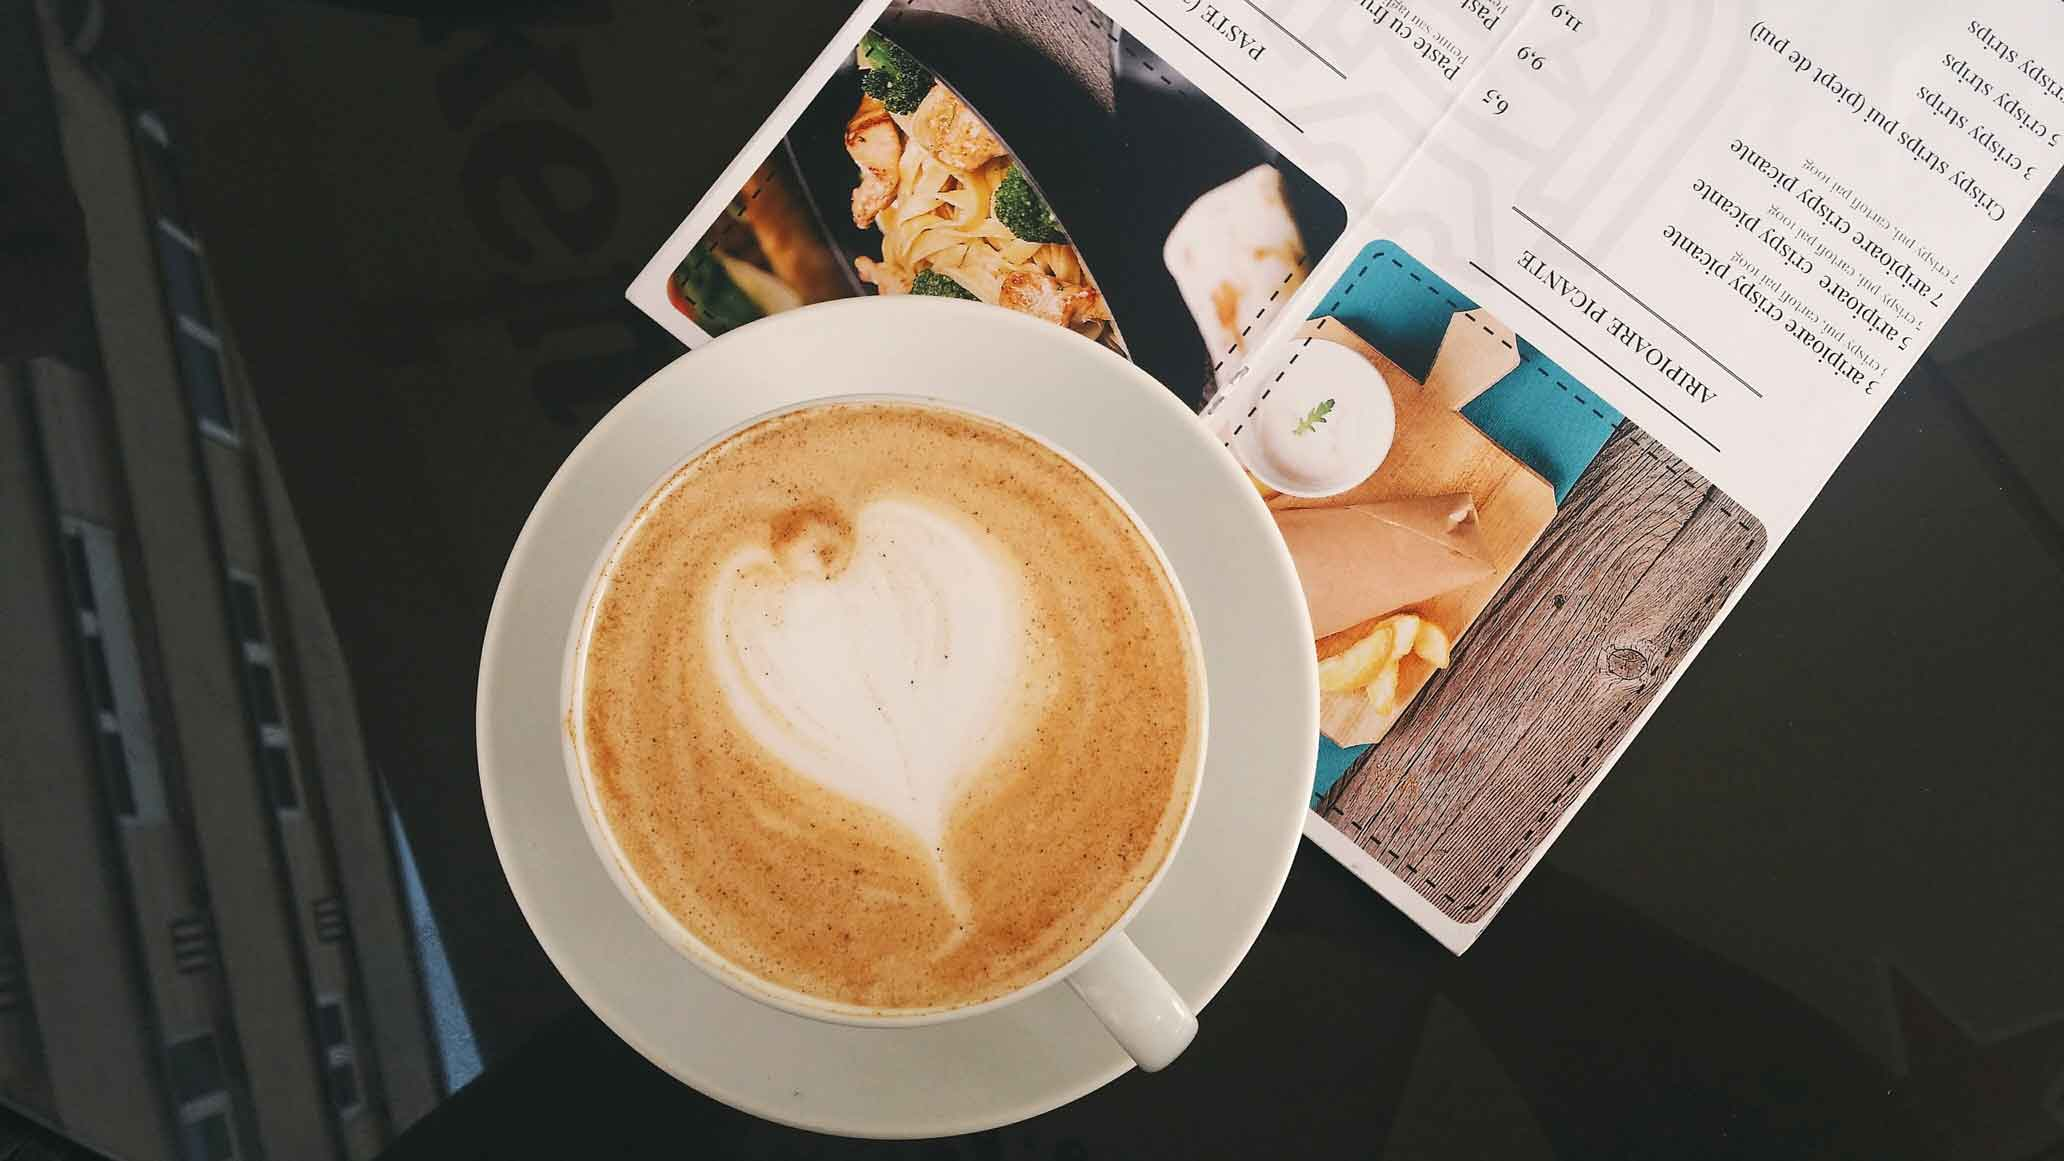 關於 Accino Coffee